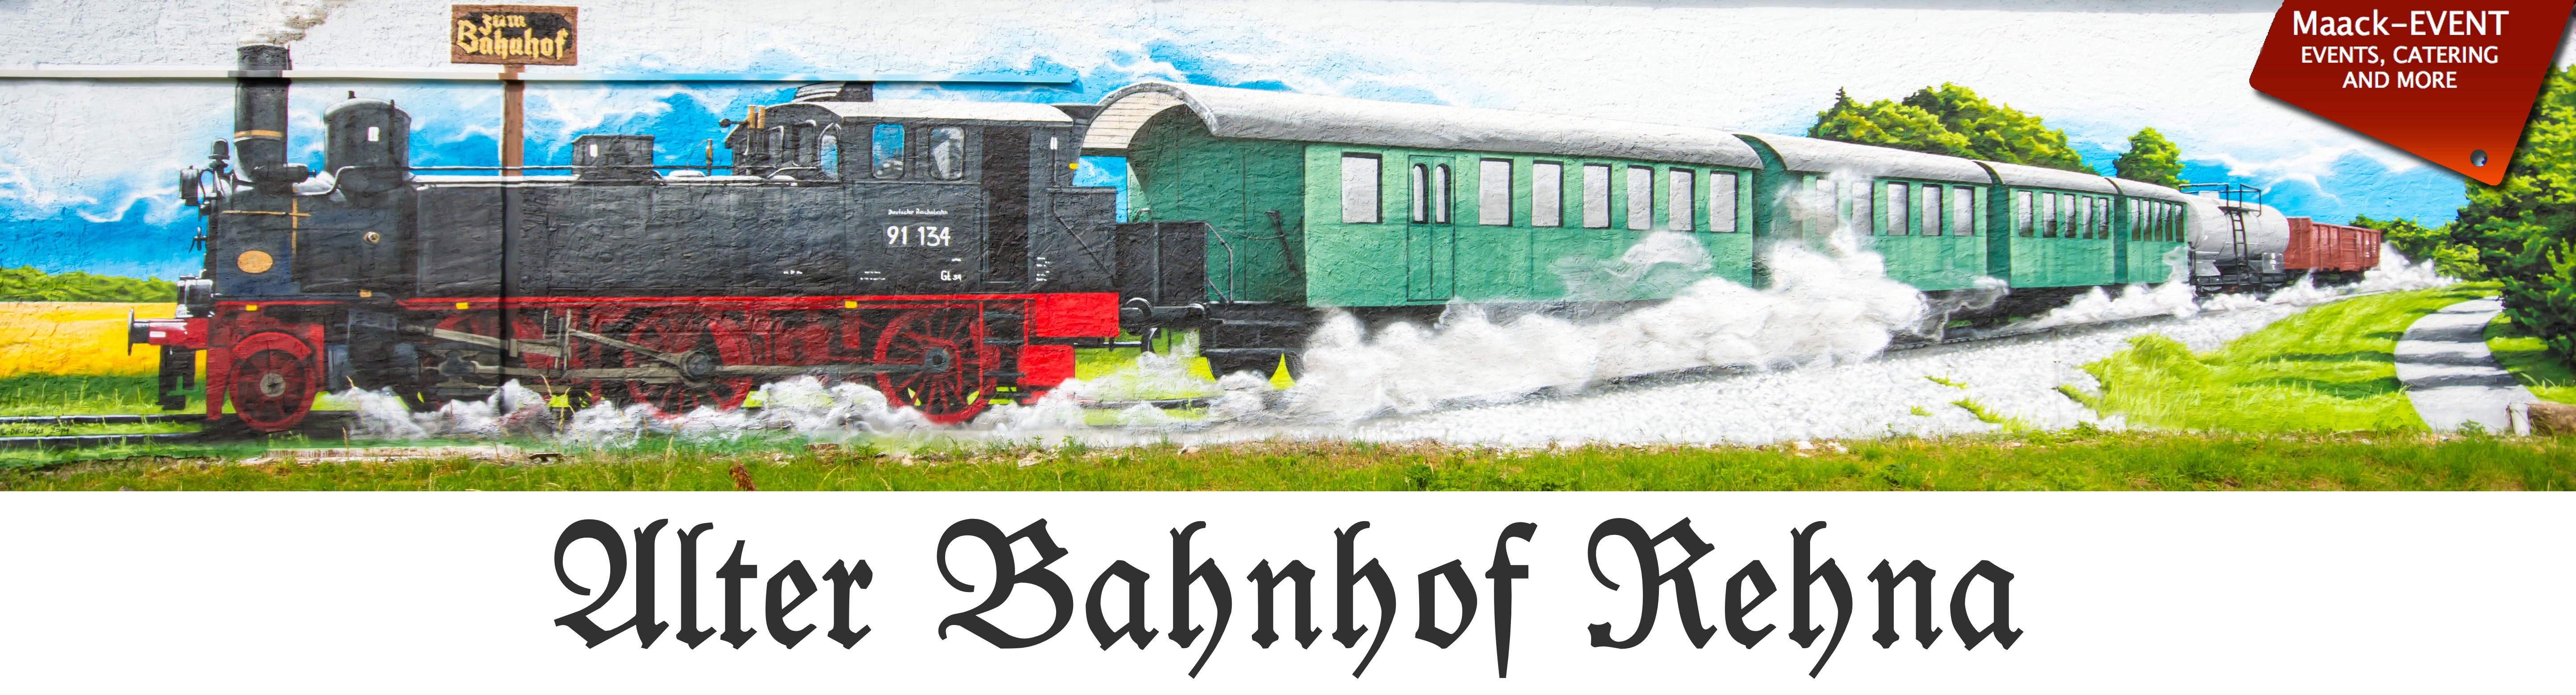 Alter Bahnhof Rehna Logo